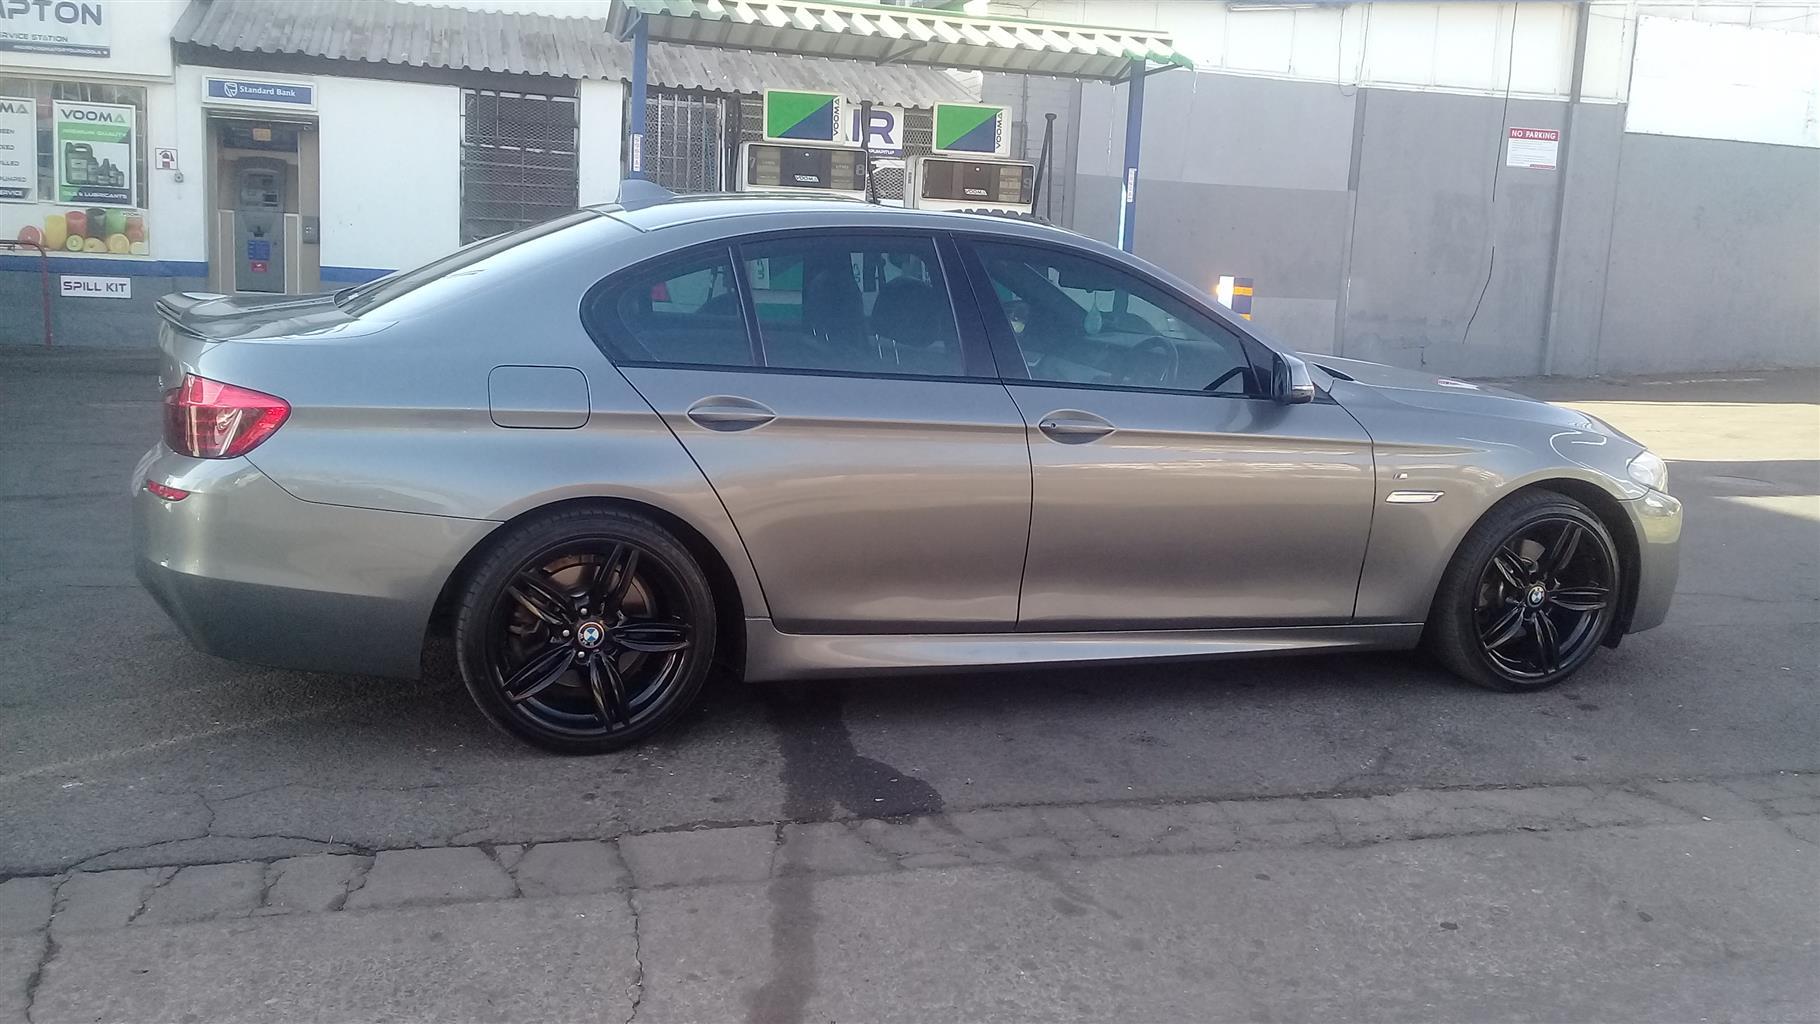 2015 BMW 5 Series sedan 520d LUXURY LINE A/T (G30) | Junk Mail